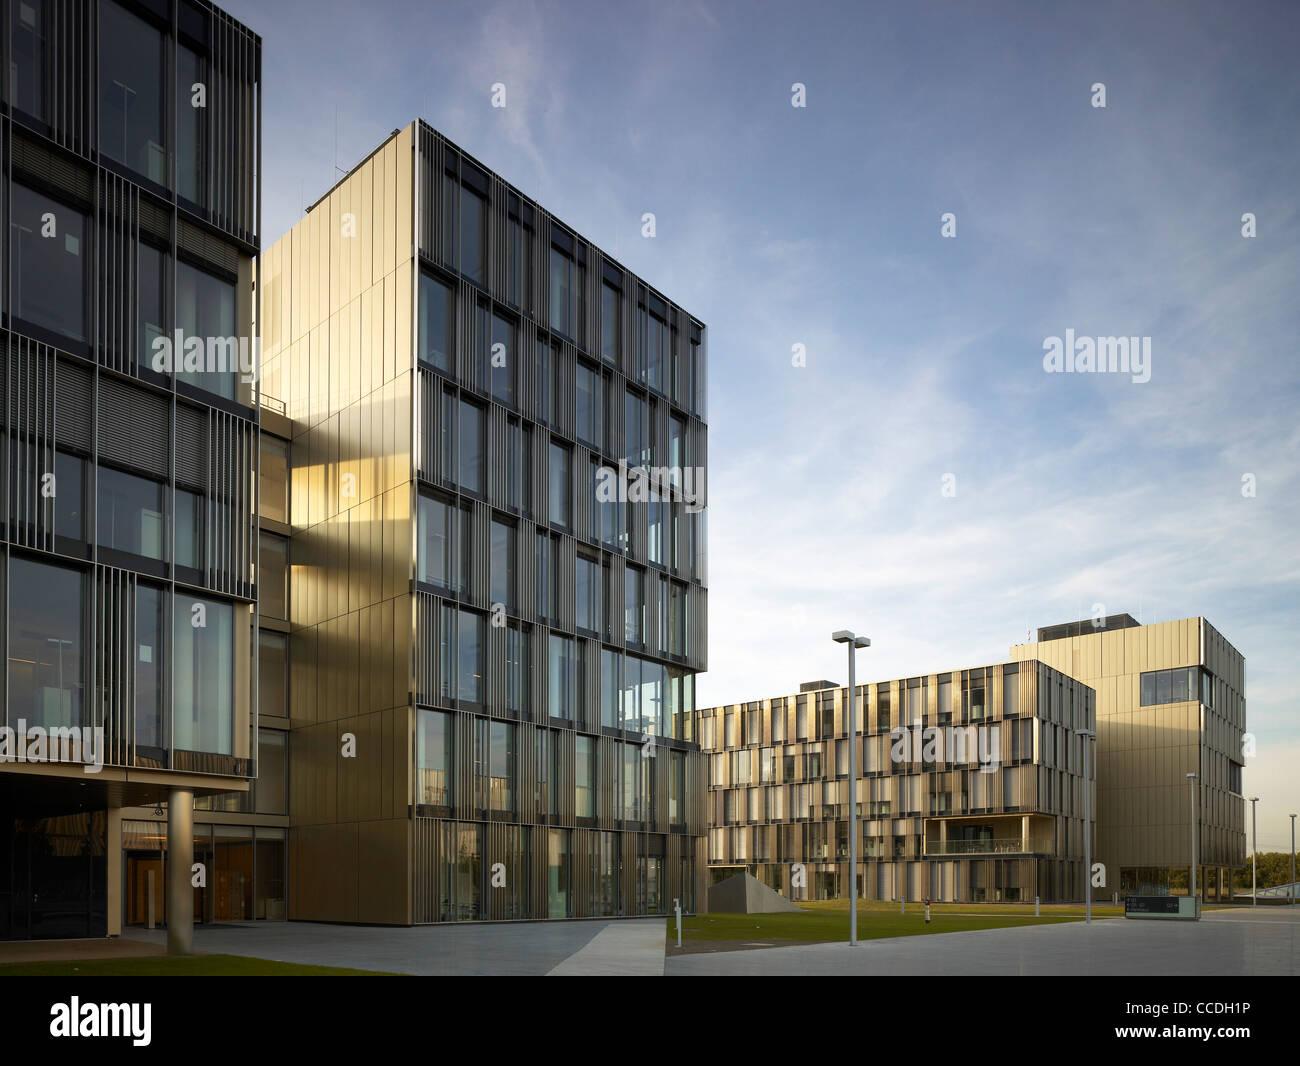 Thyssenkrupp Headquarters Essen Stock Photos ...